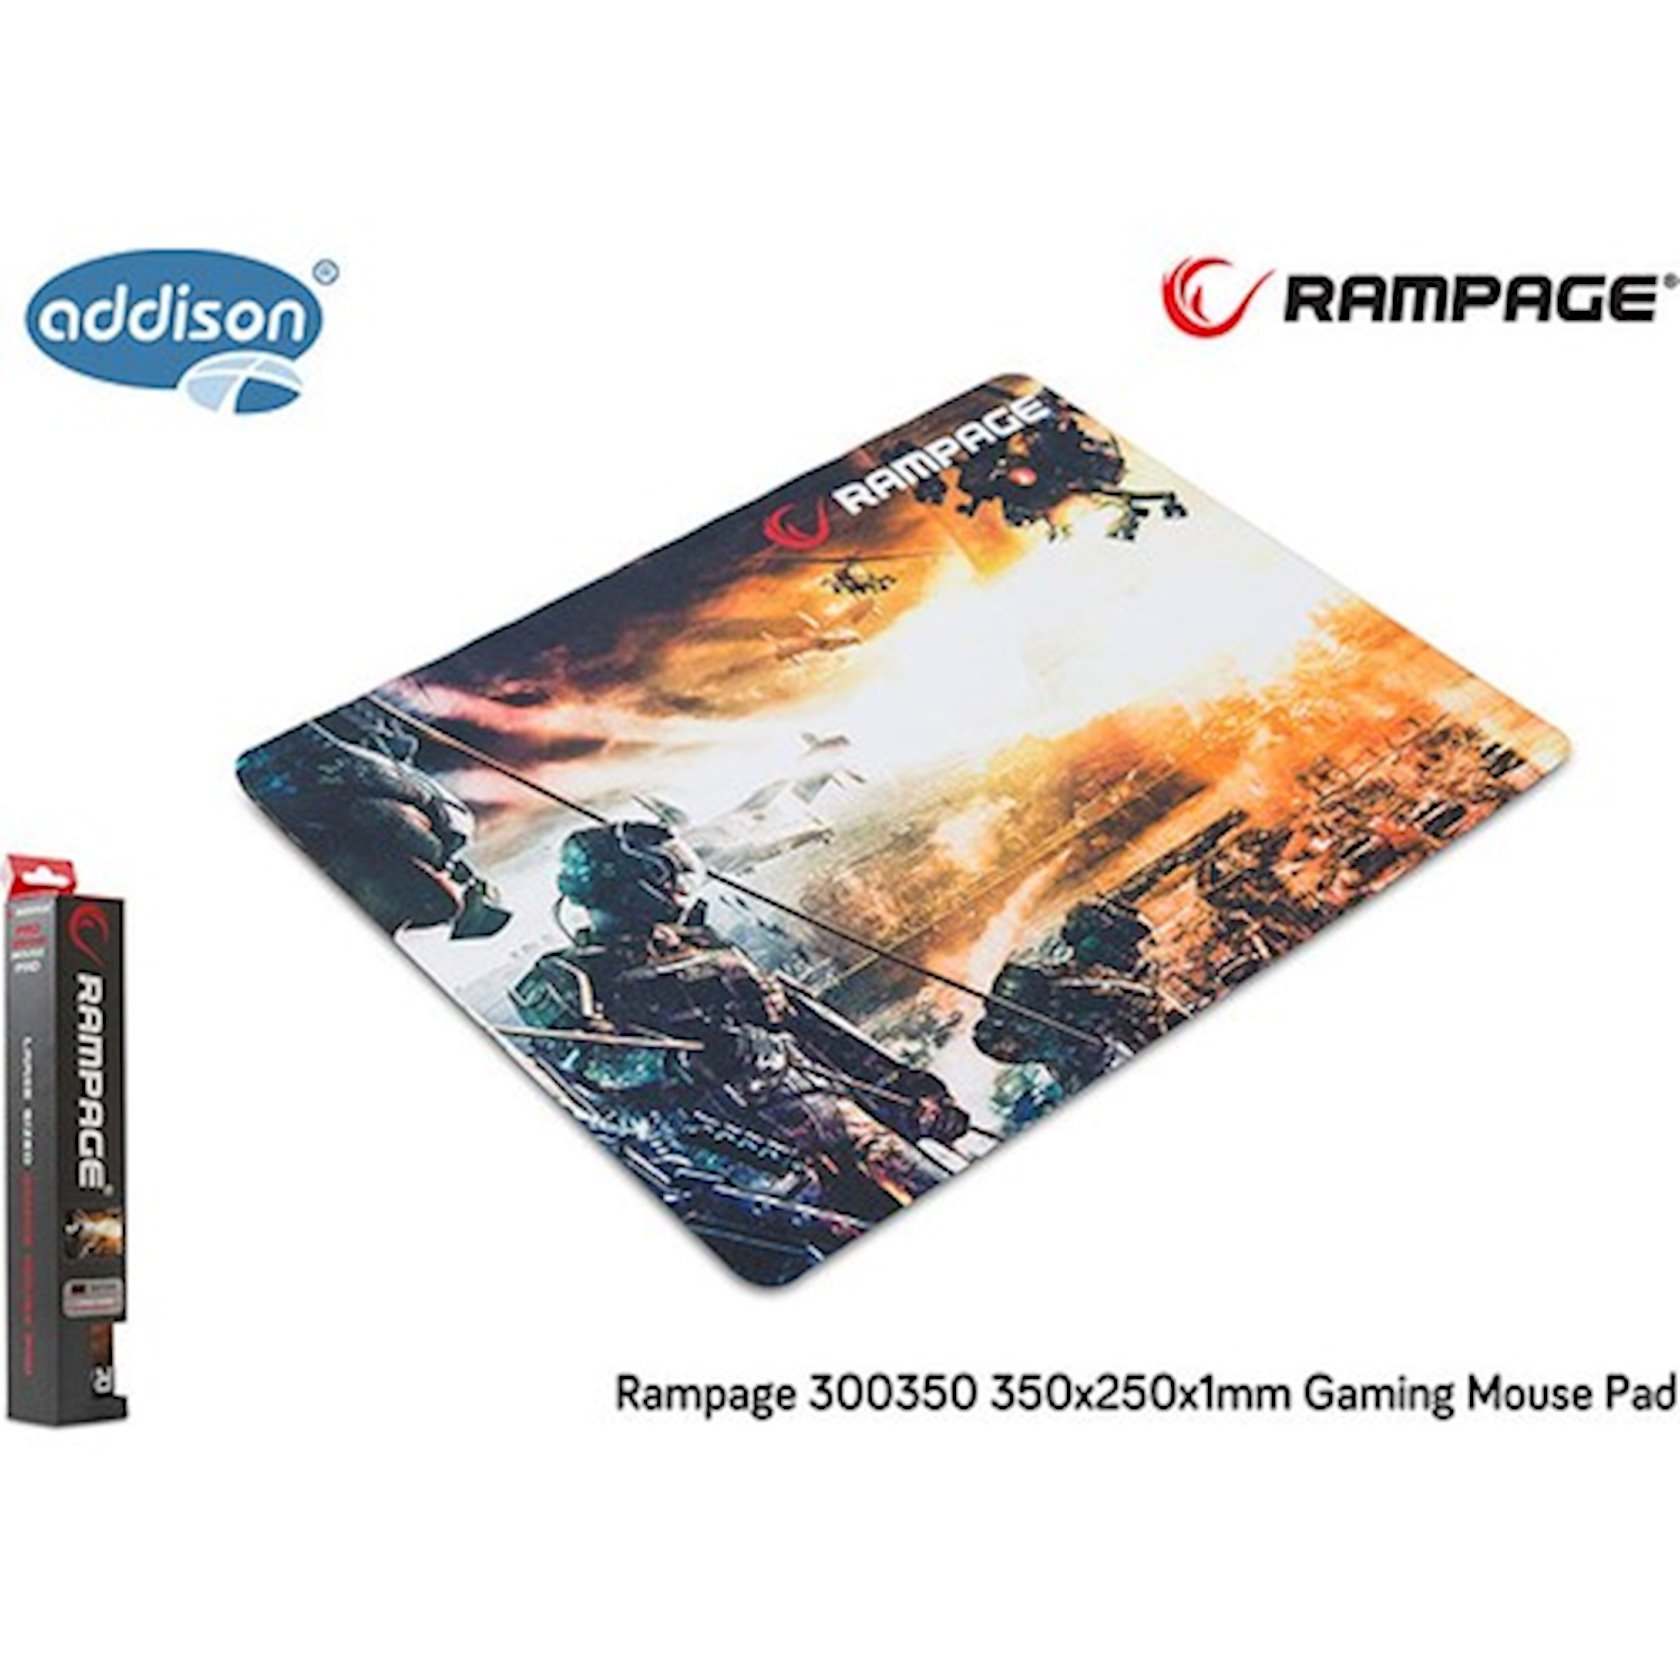 Siçan altlığı Addison Rampage 300350 Gaming